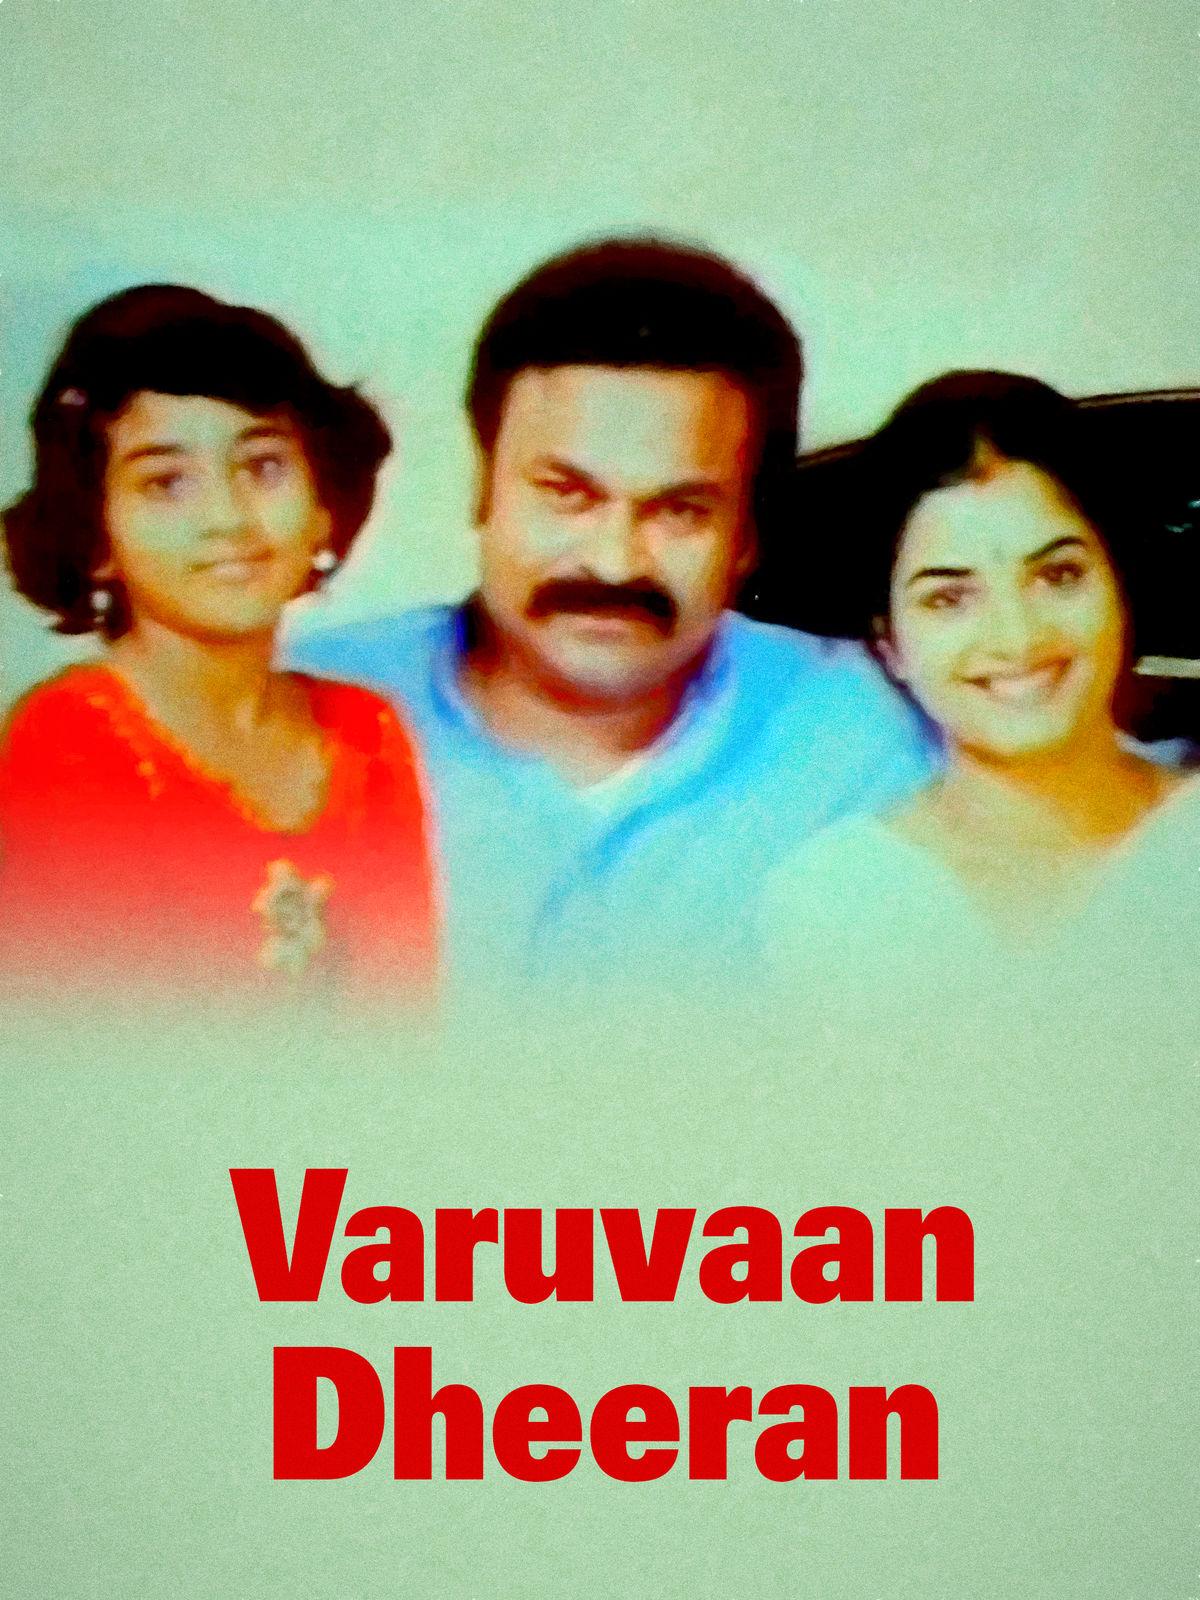 Varuvaan Dheeran